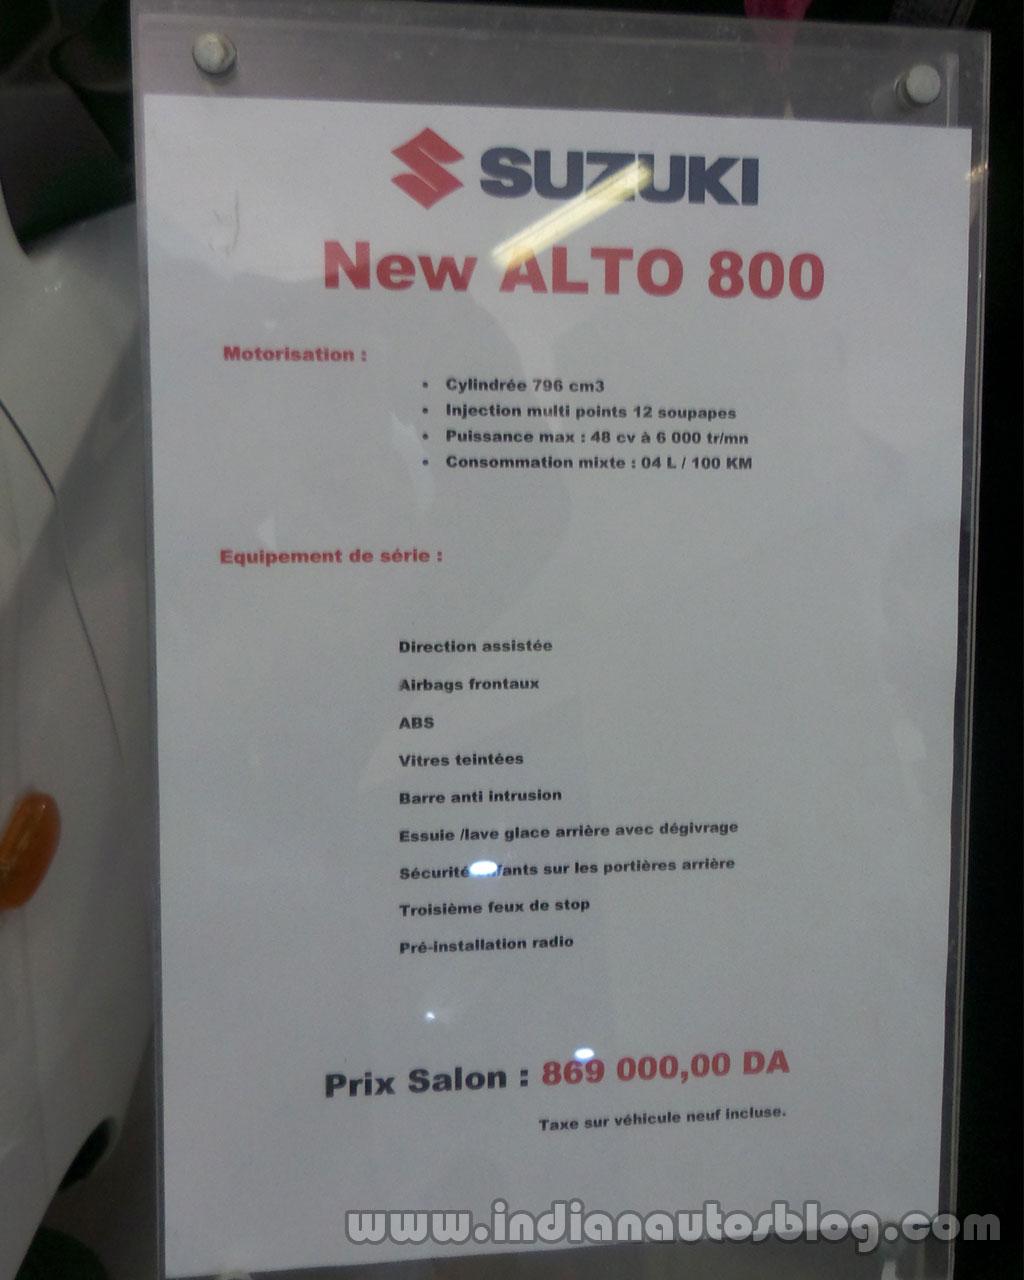 Suzuki-Alto-800-info-sheet-at-algeria-Motor-Show